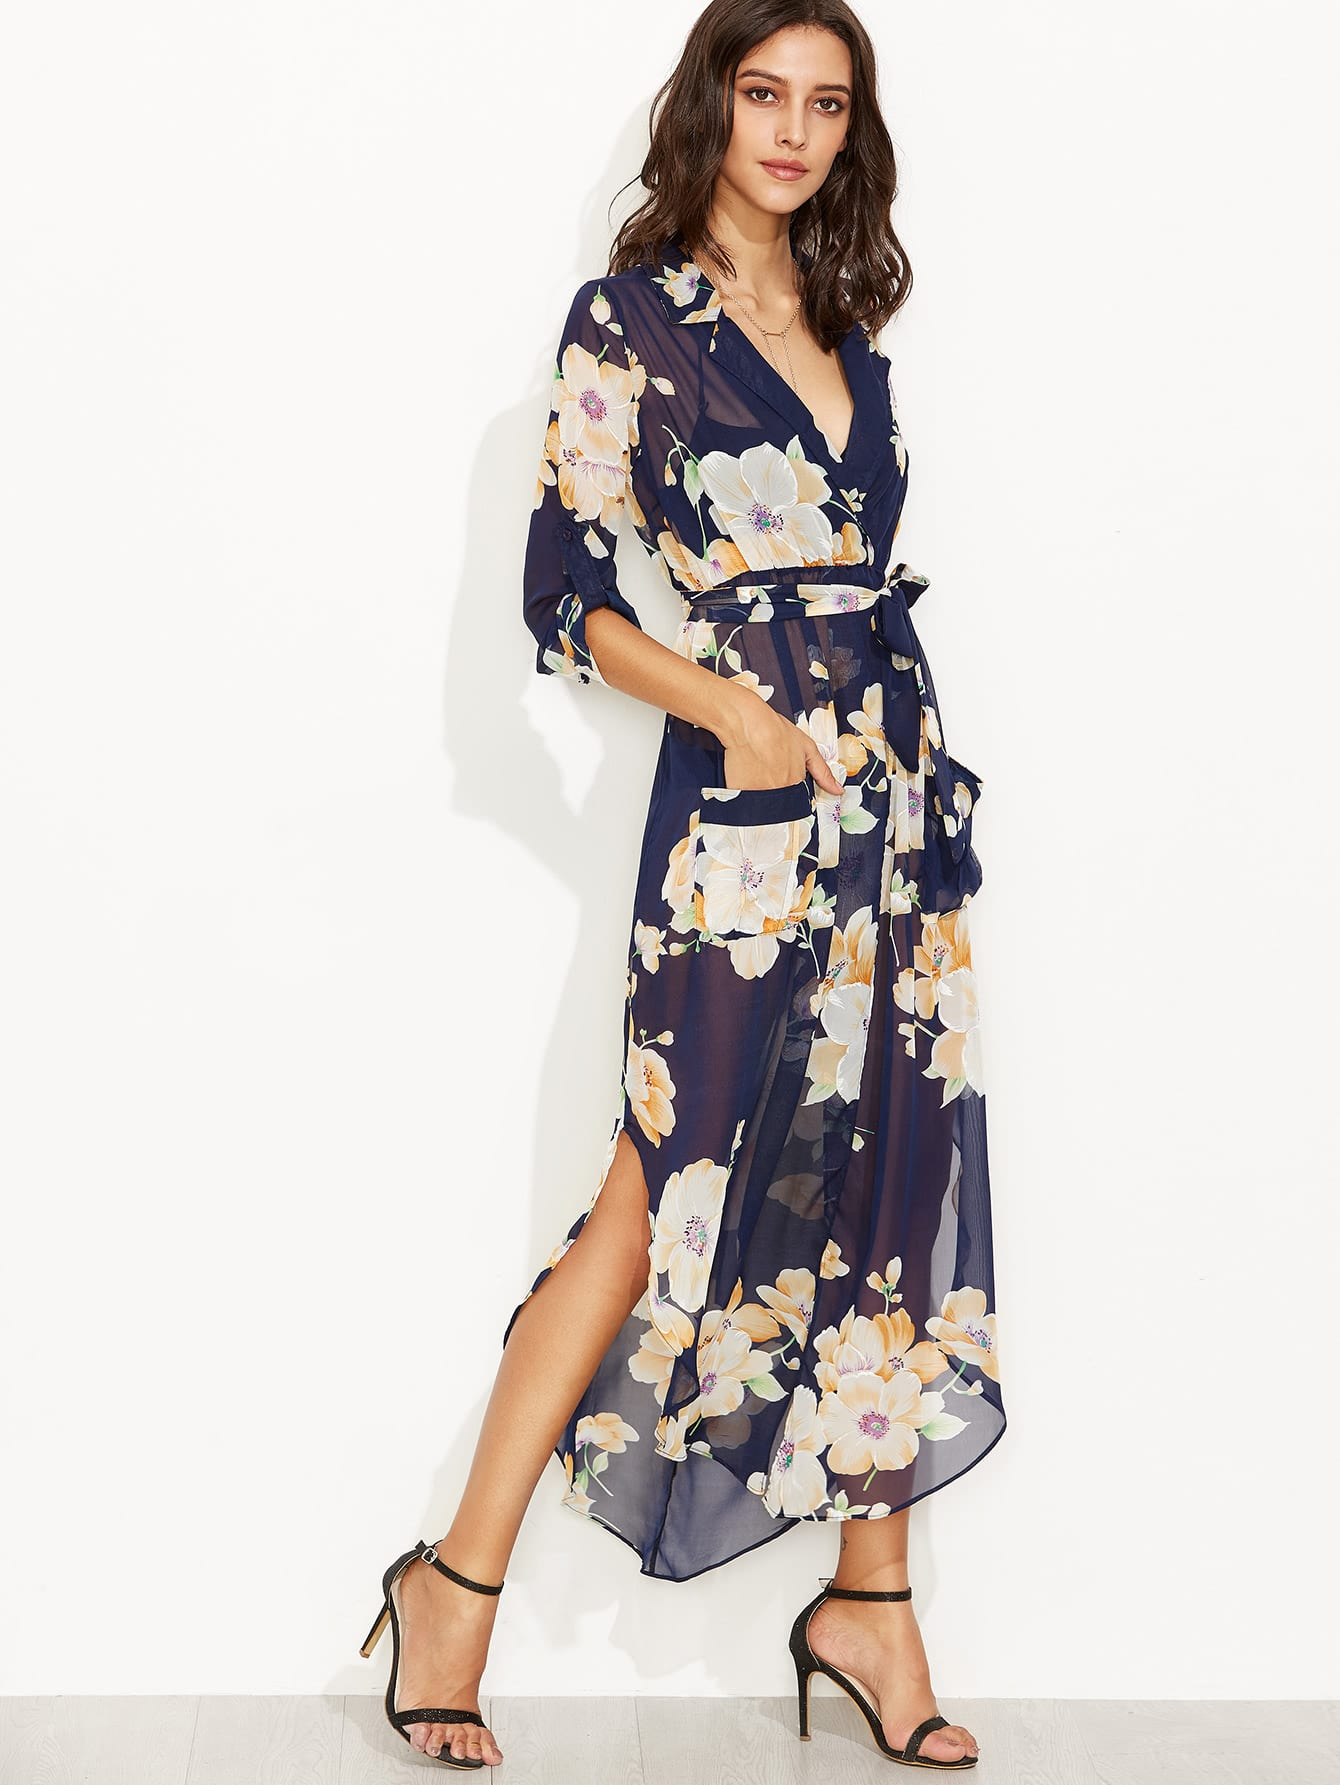 Floral Print Self Tie Surplice Wrap Sheer Dress Sheinsheinside